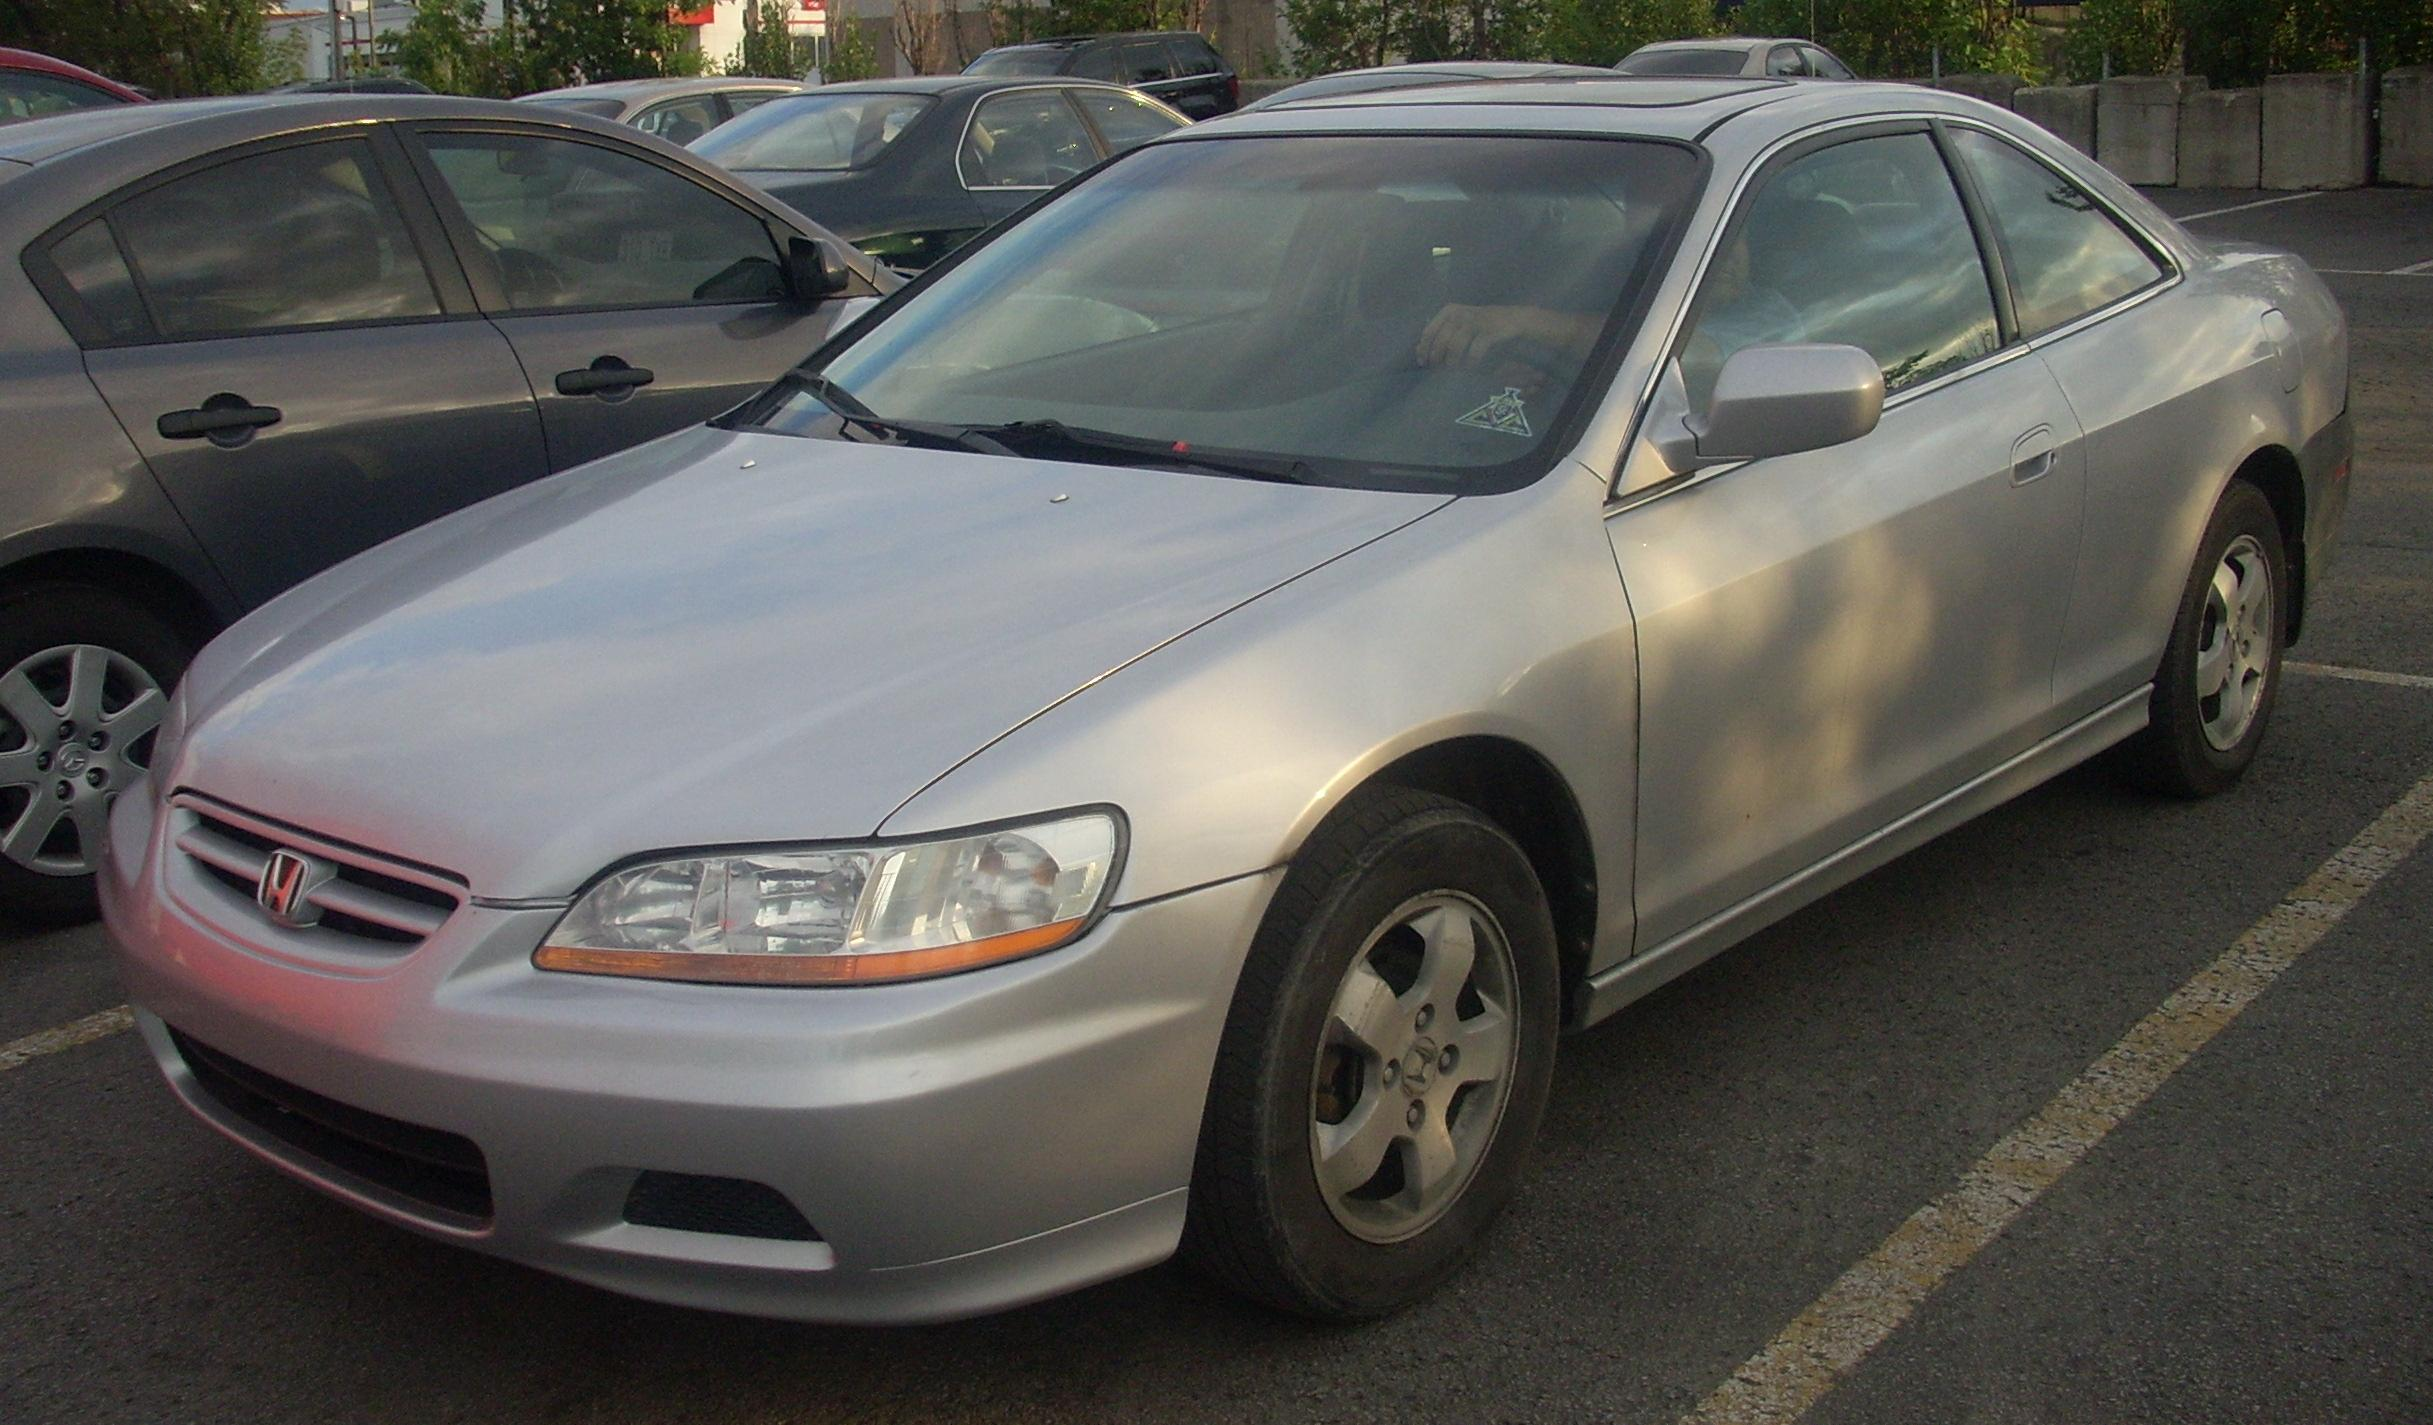 Great File:2001 02 Honda Accord Coupe (Orange Julep).JPG